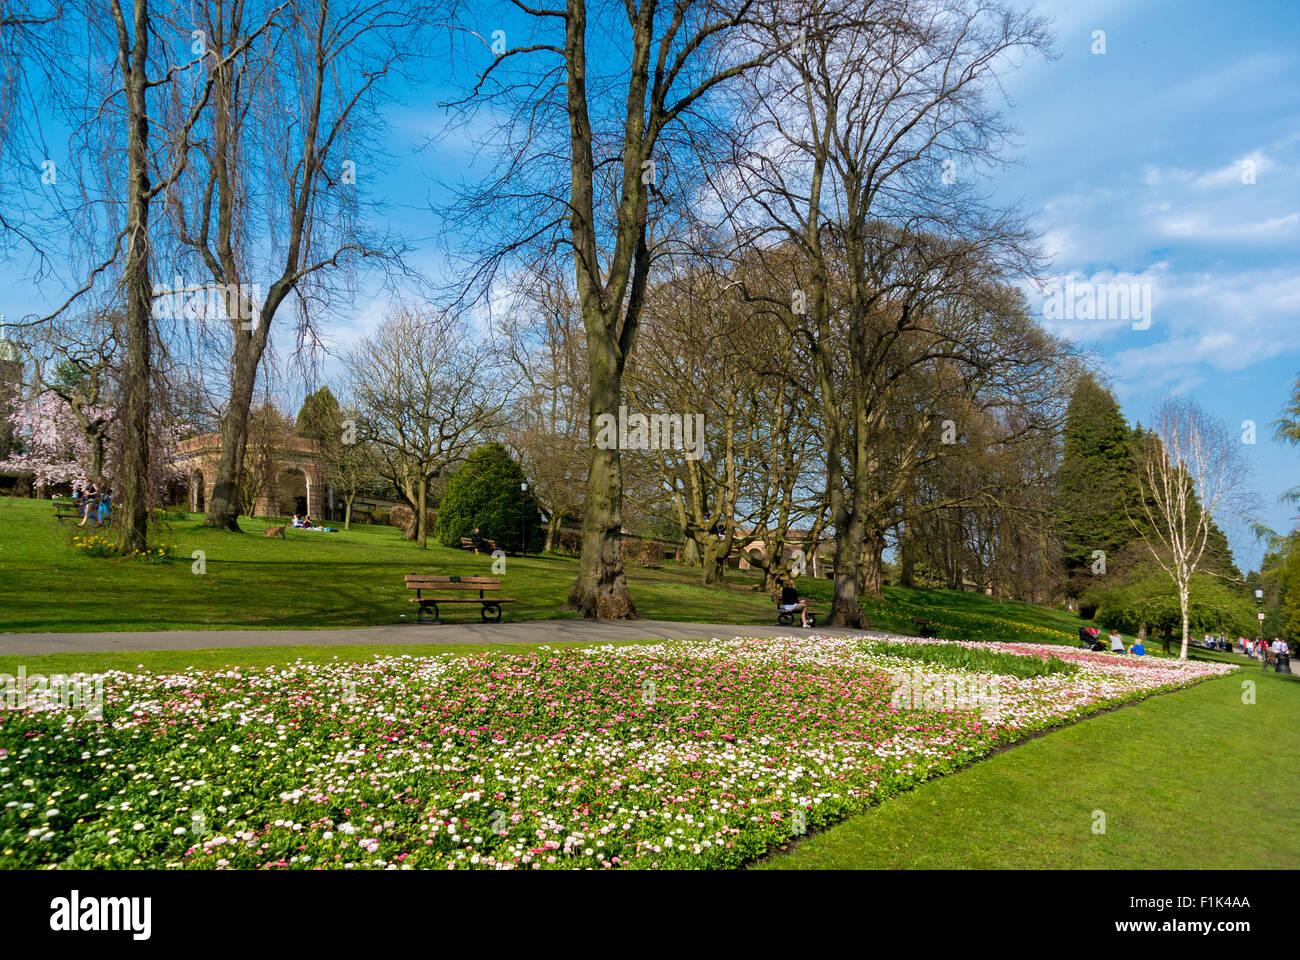 Spring flowerbeds in the Valley gardens, Harrogate Stock Photo